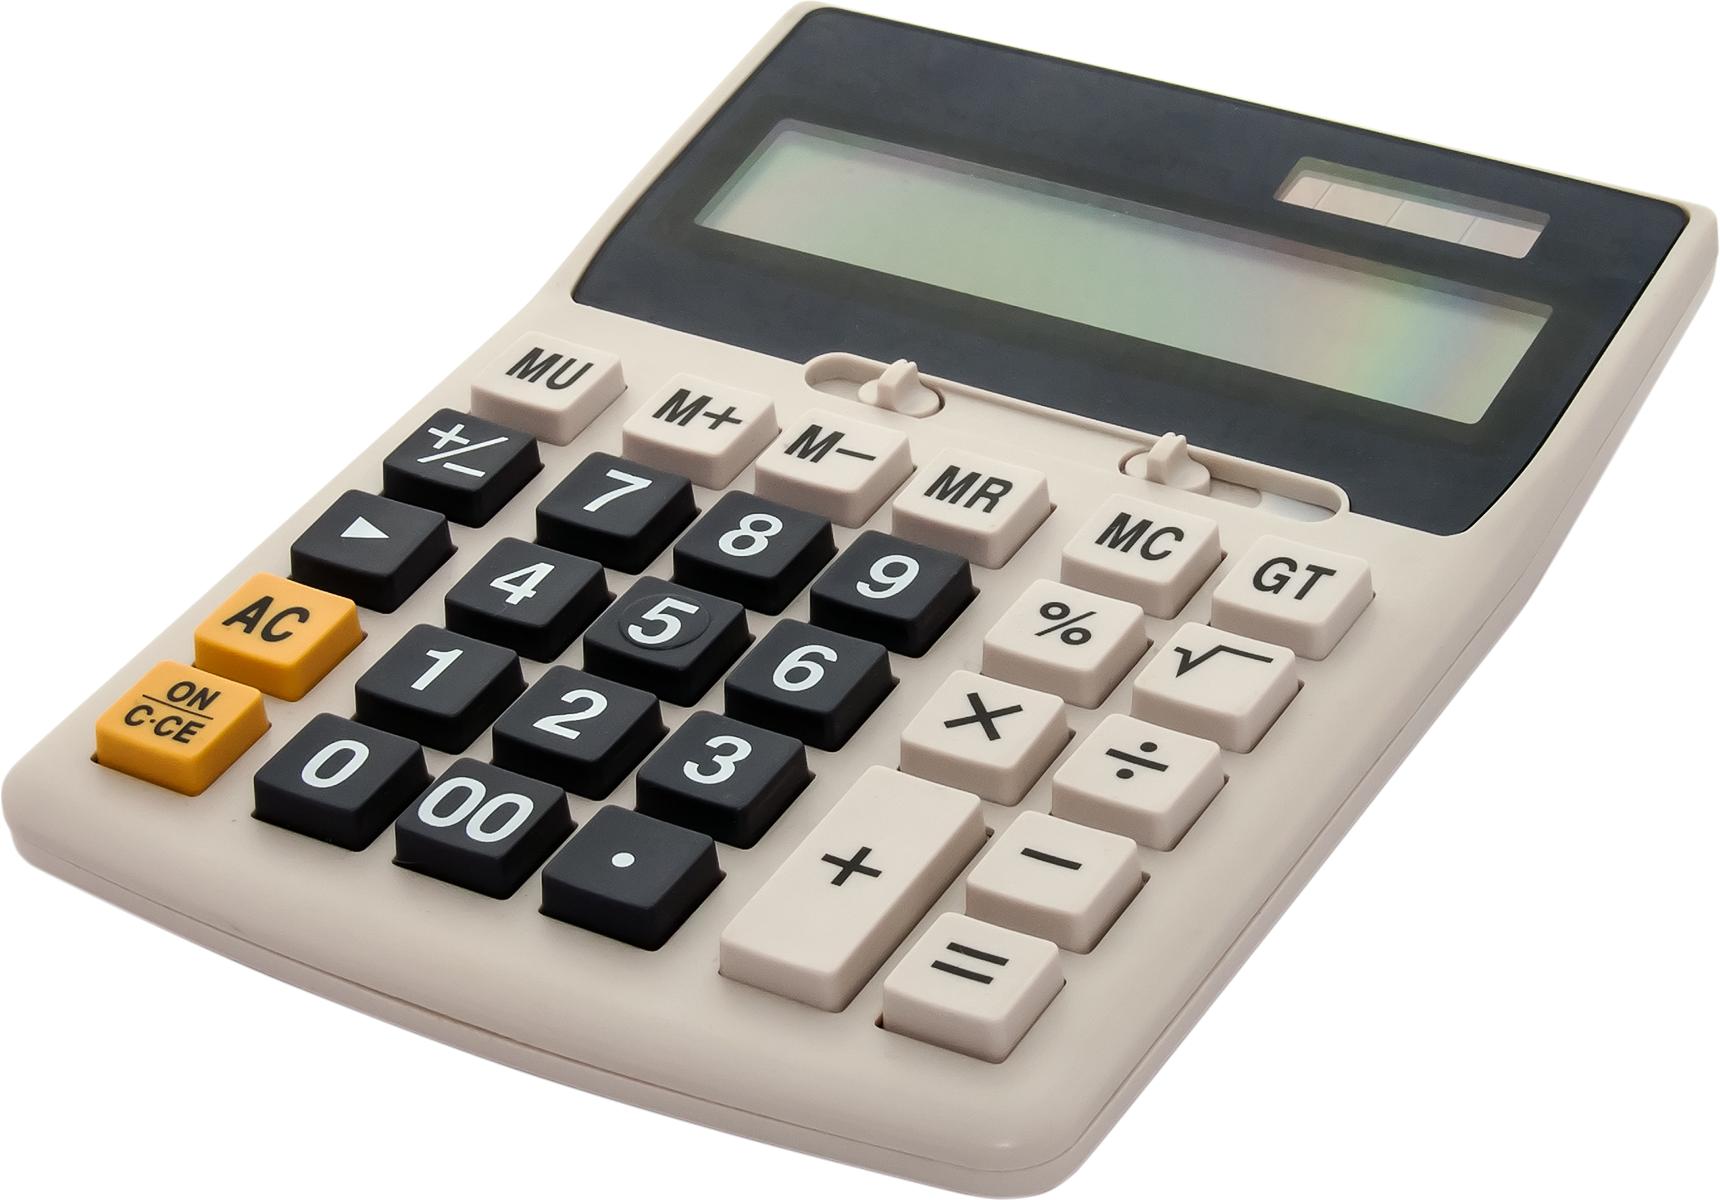 Math Calculator PNG Image - PurePNG   Free transparent CC0 ...